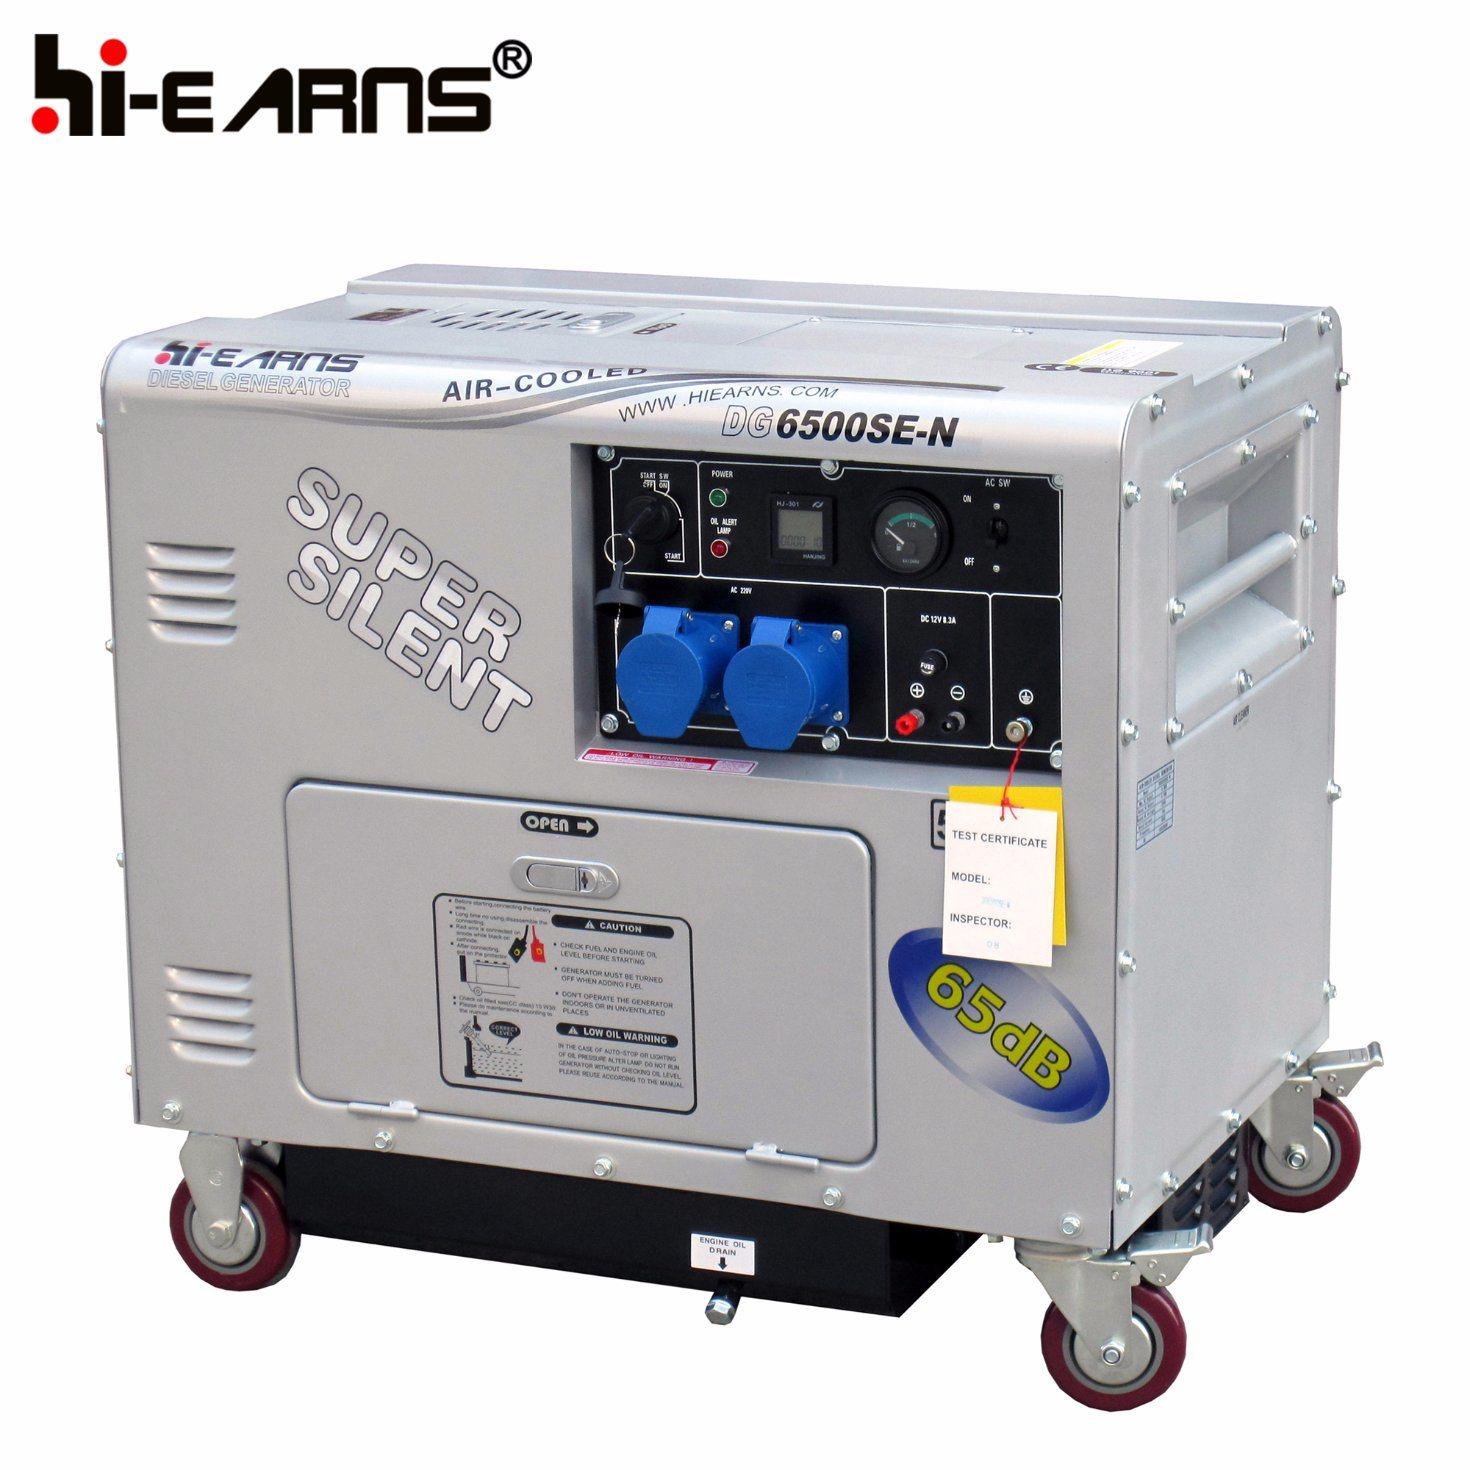 China 5kw Super Silent Diesel Generator for Home Use DG6500SE N